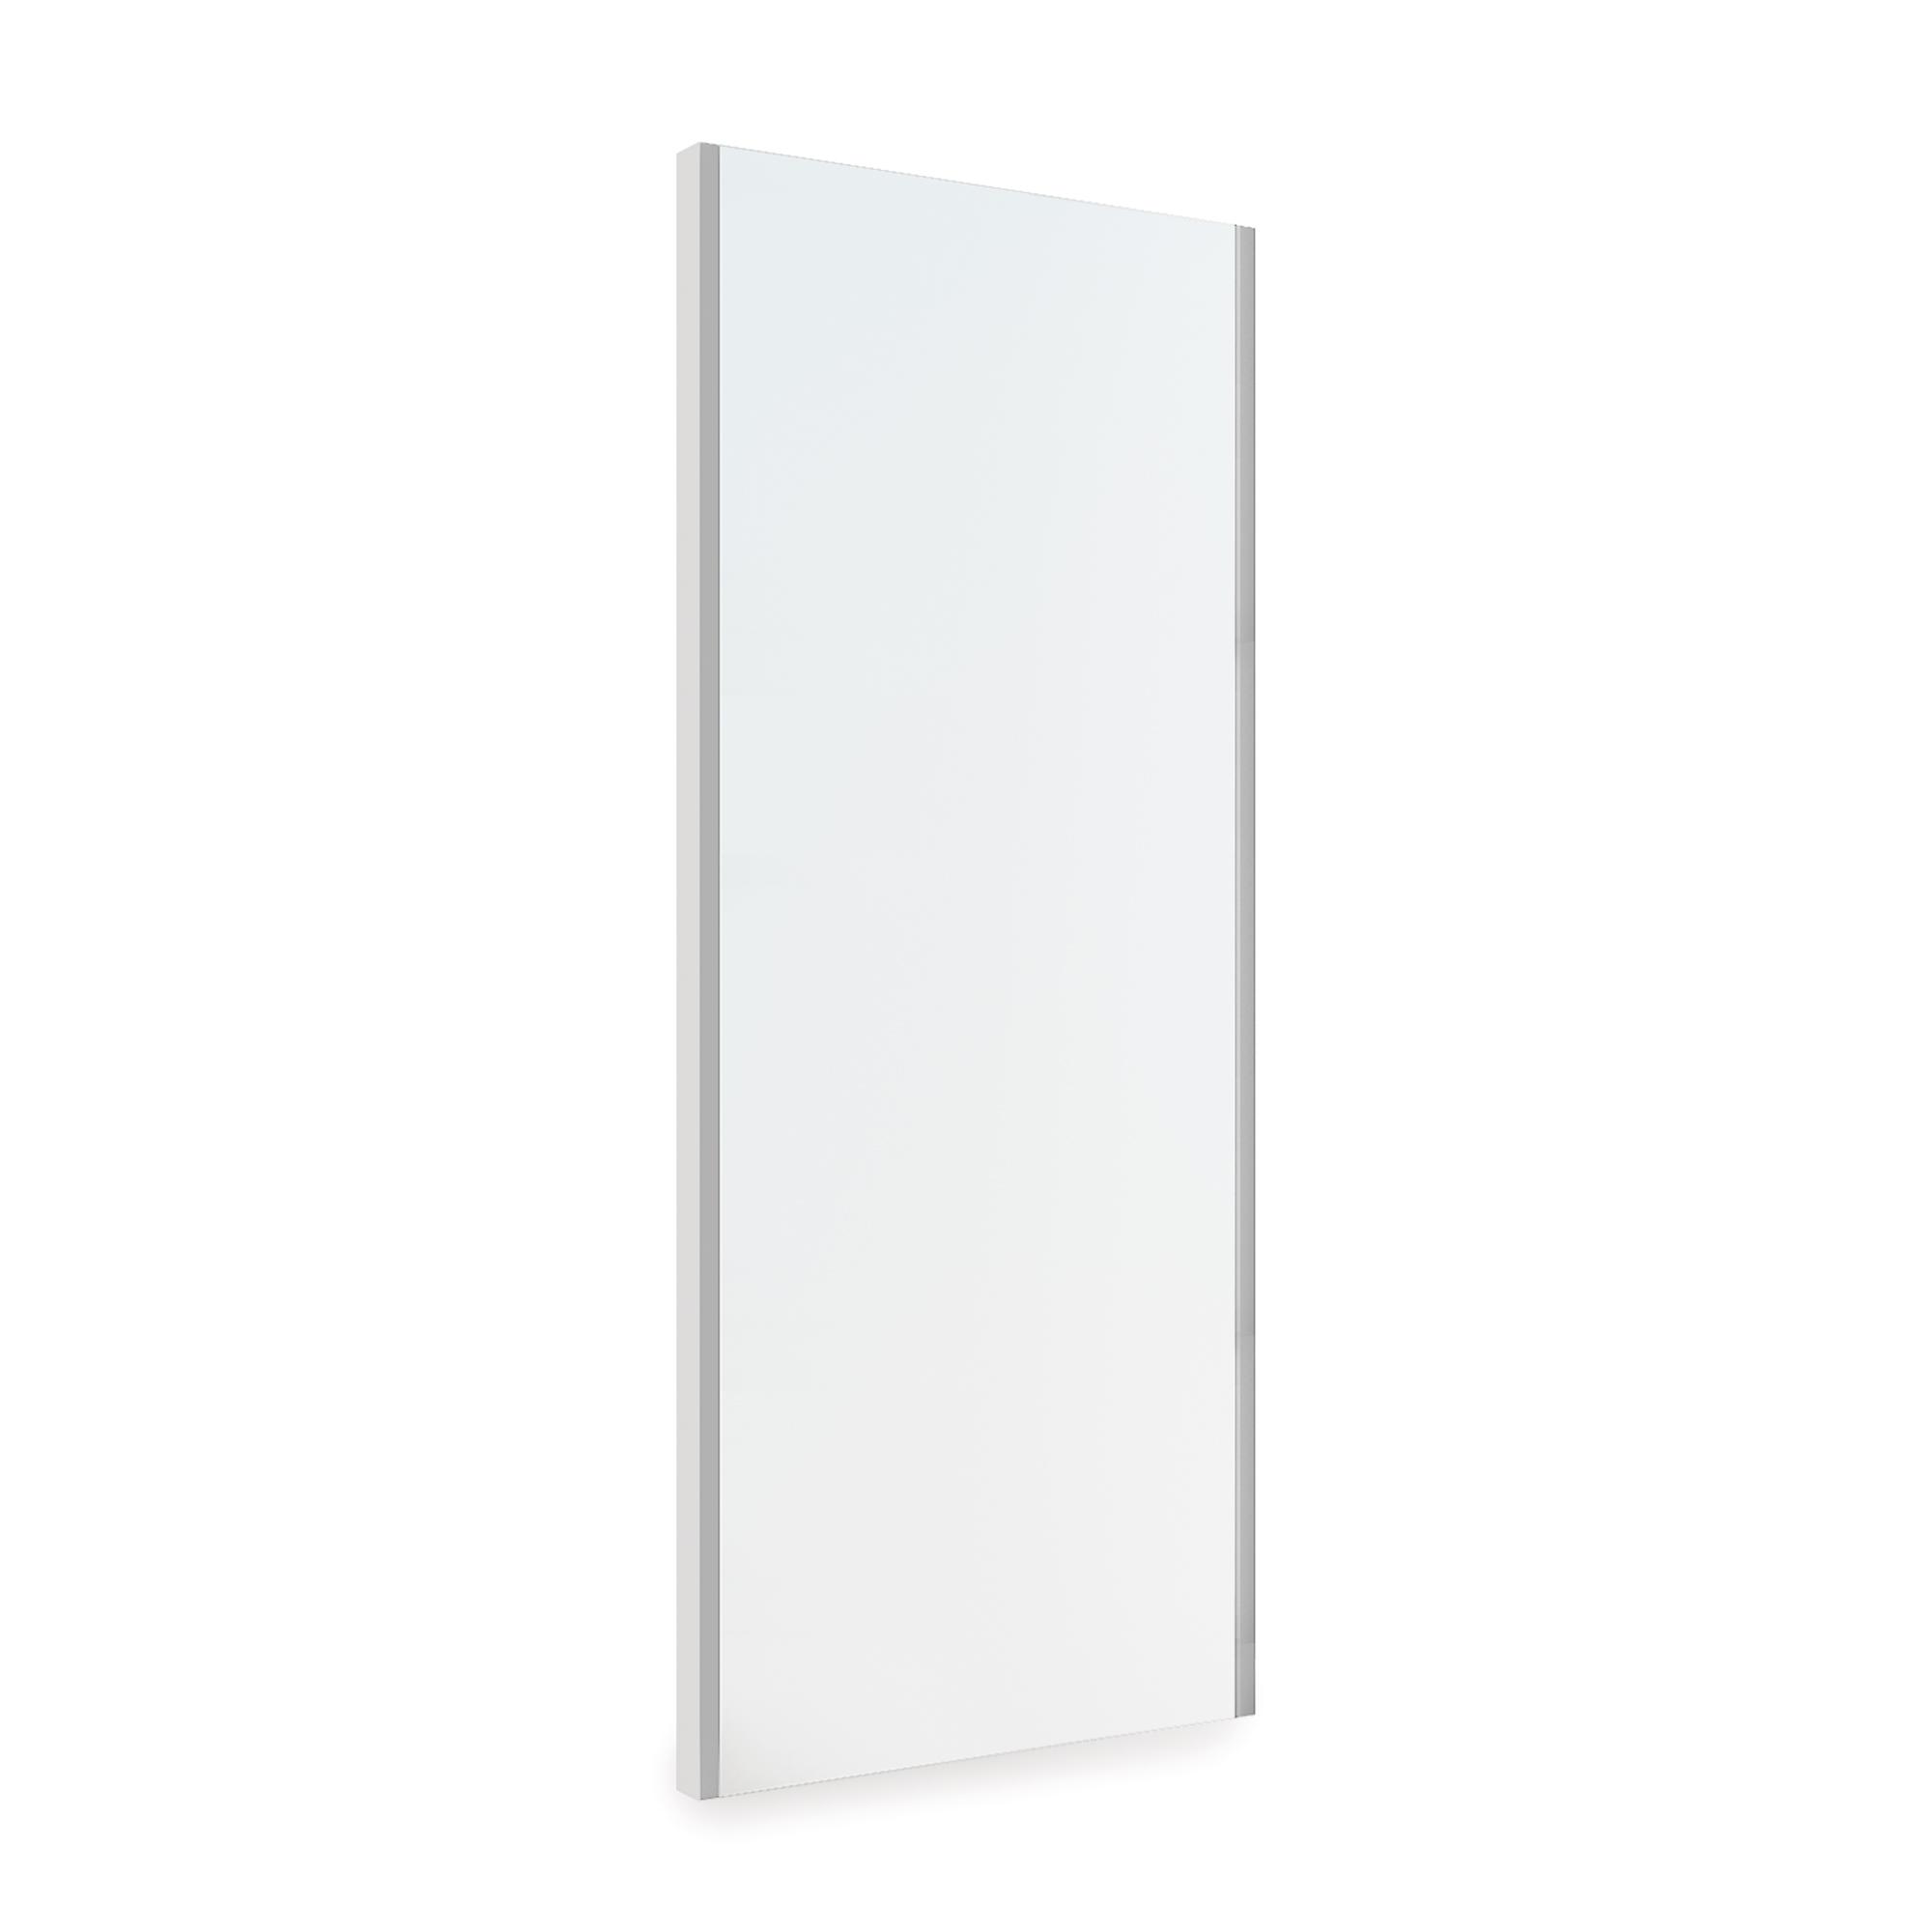 Emuca Specchio estraibile per interni di armadio, regolabile, 340 x 1000 mm, grigio metallizzato.